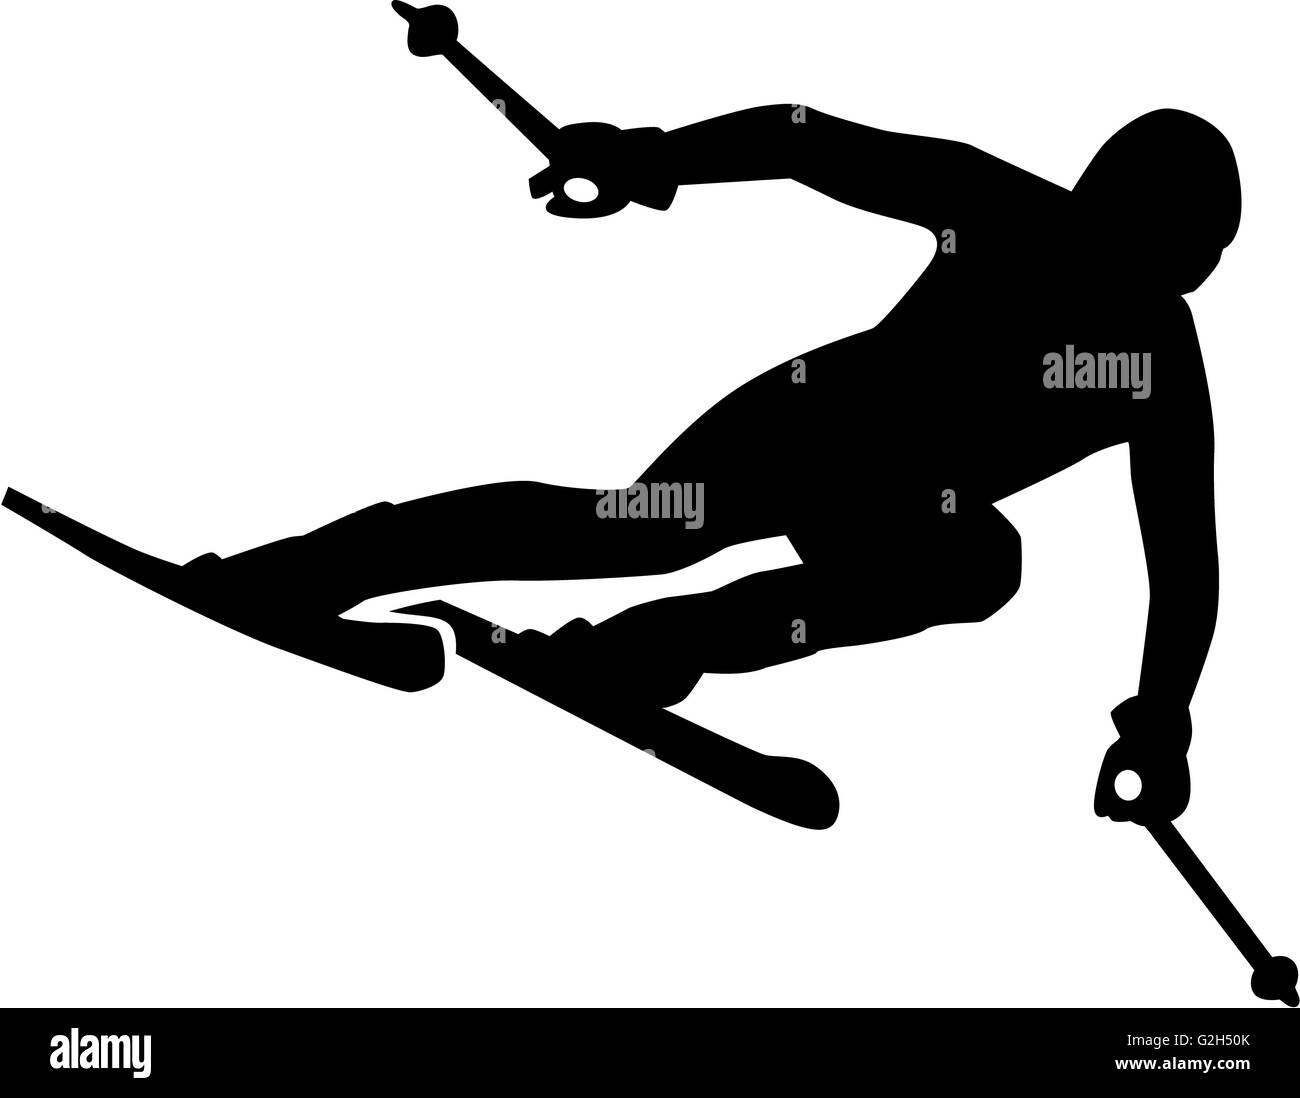 Ski Run Silhouette - Stock Image